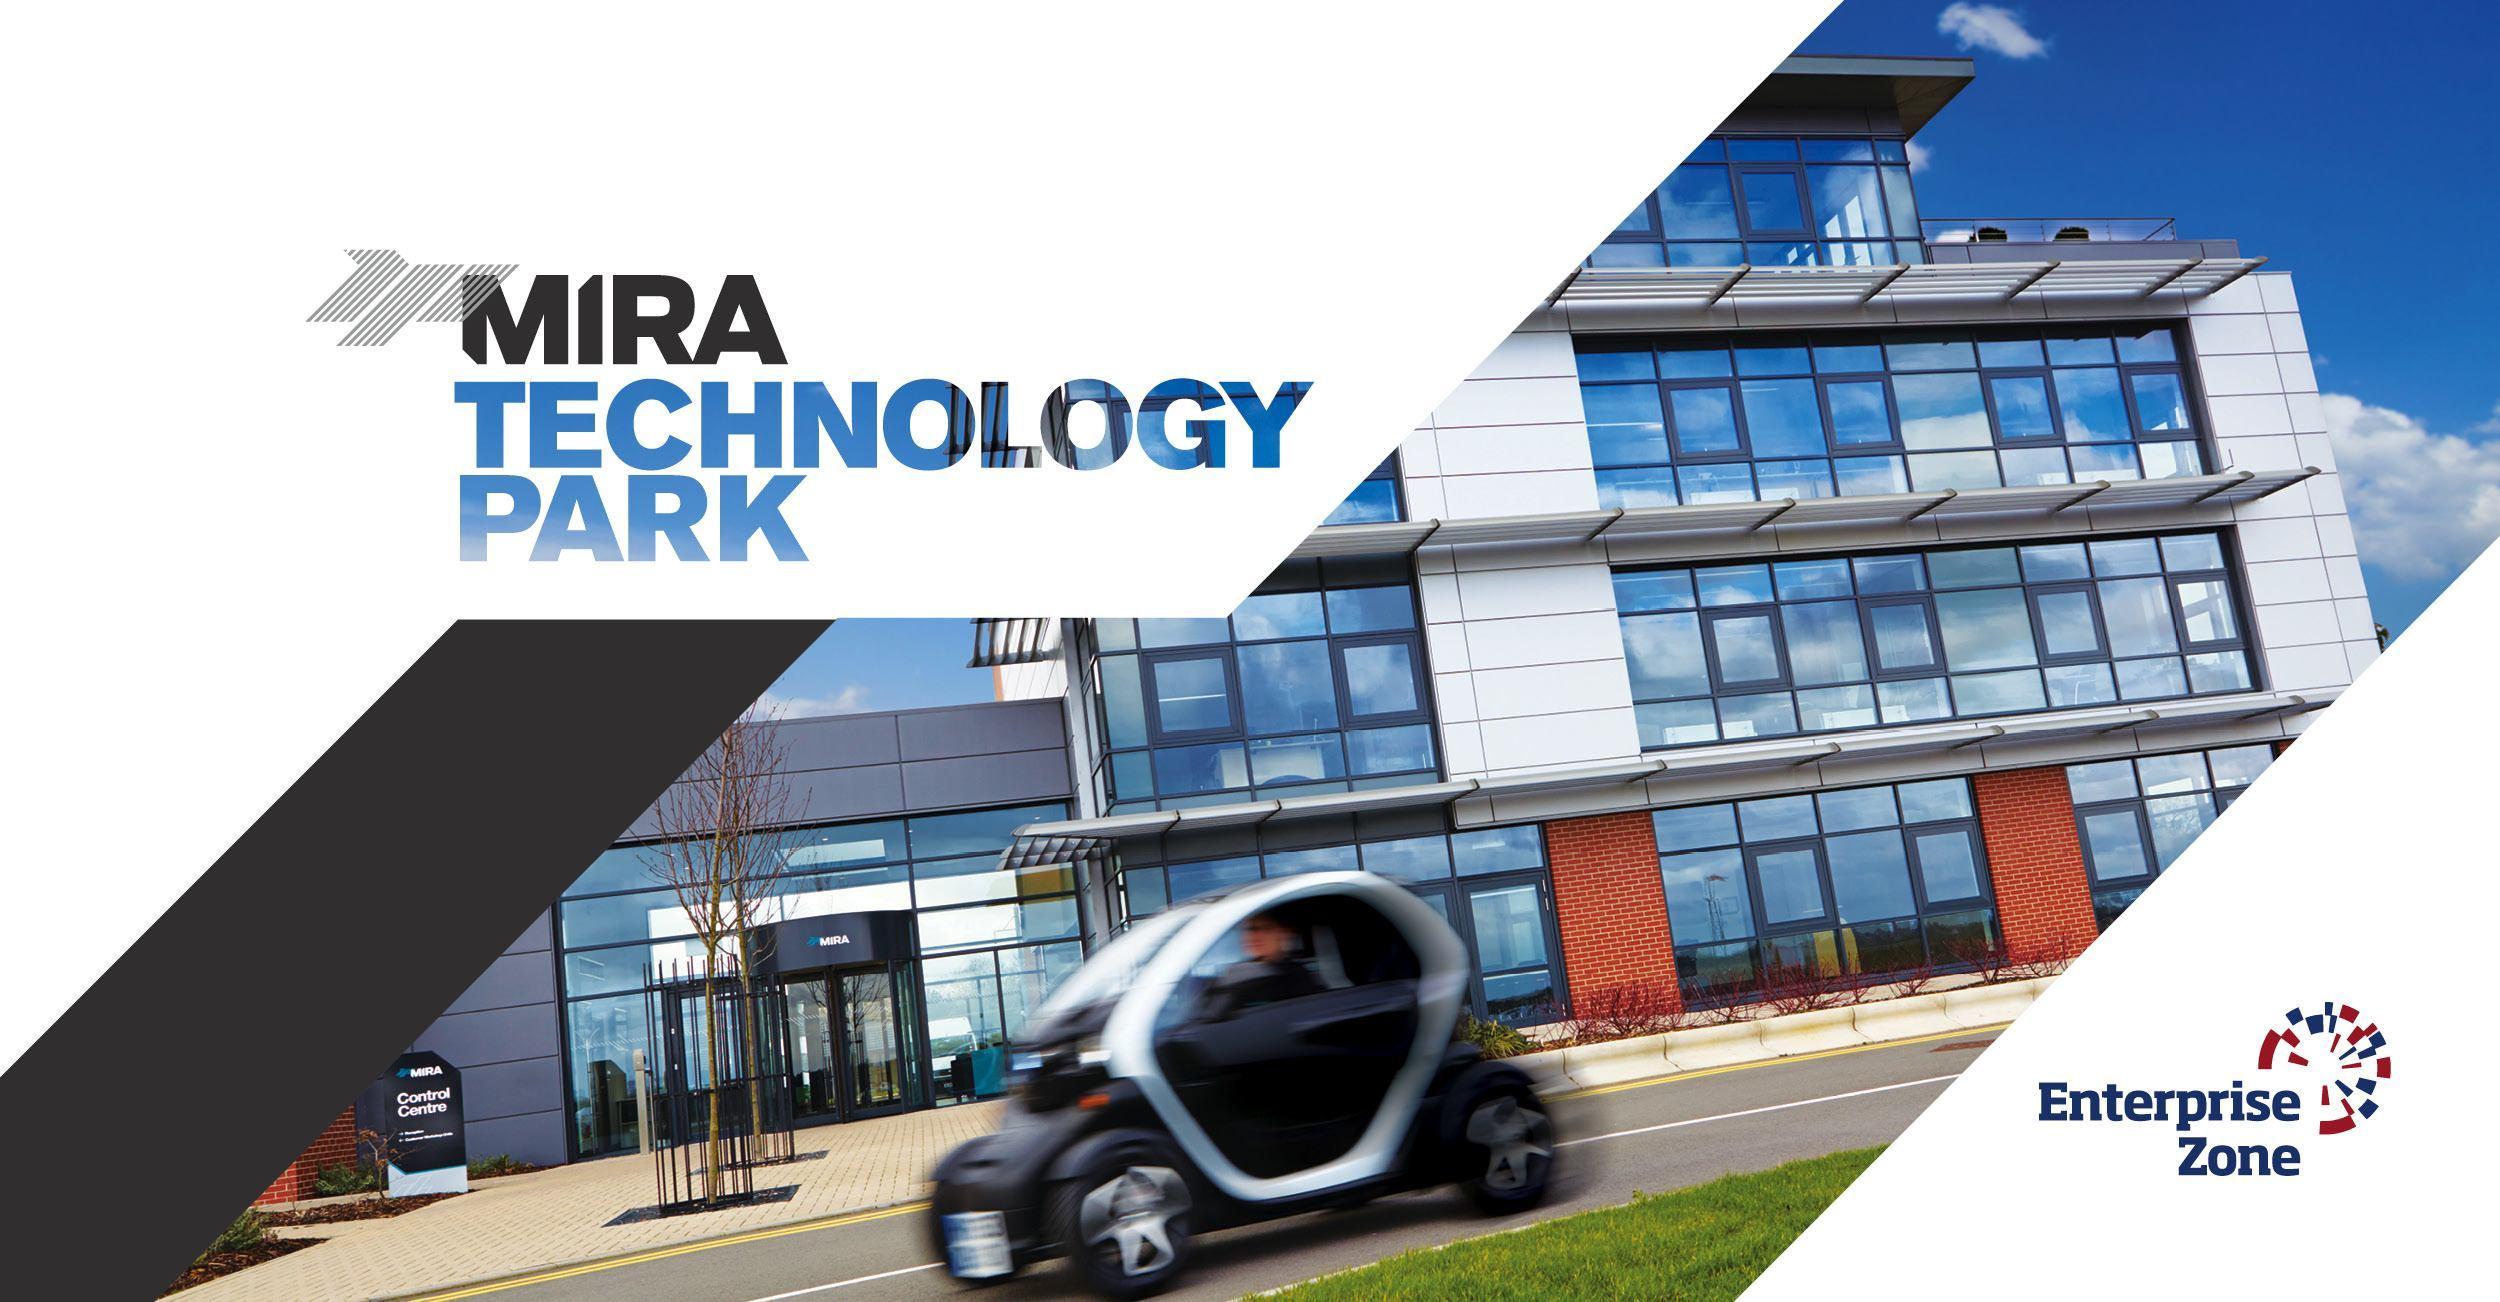 MIRA TECHNOLOGY PARK - 6